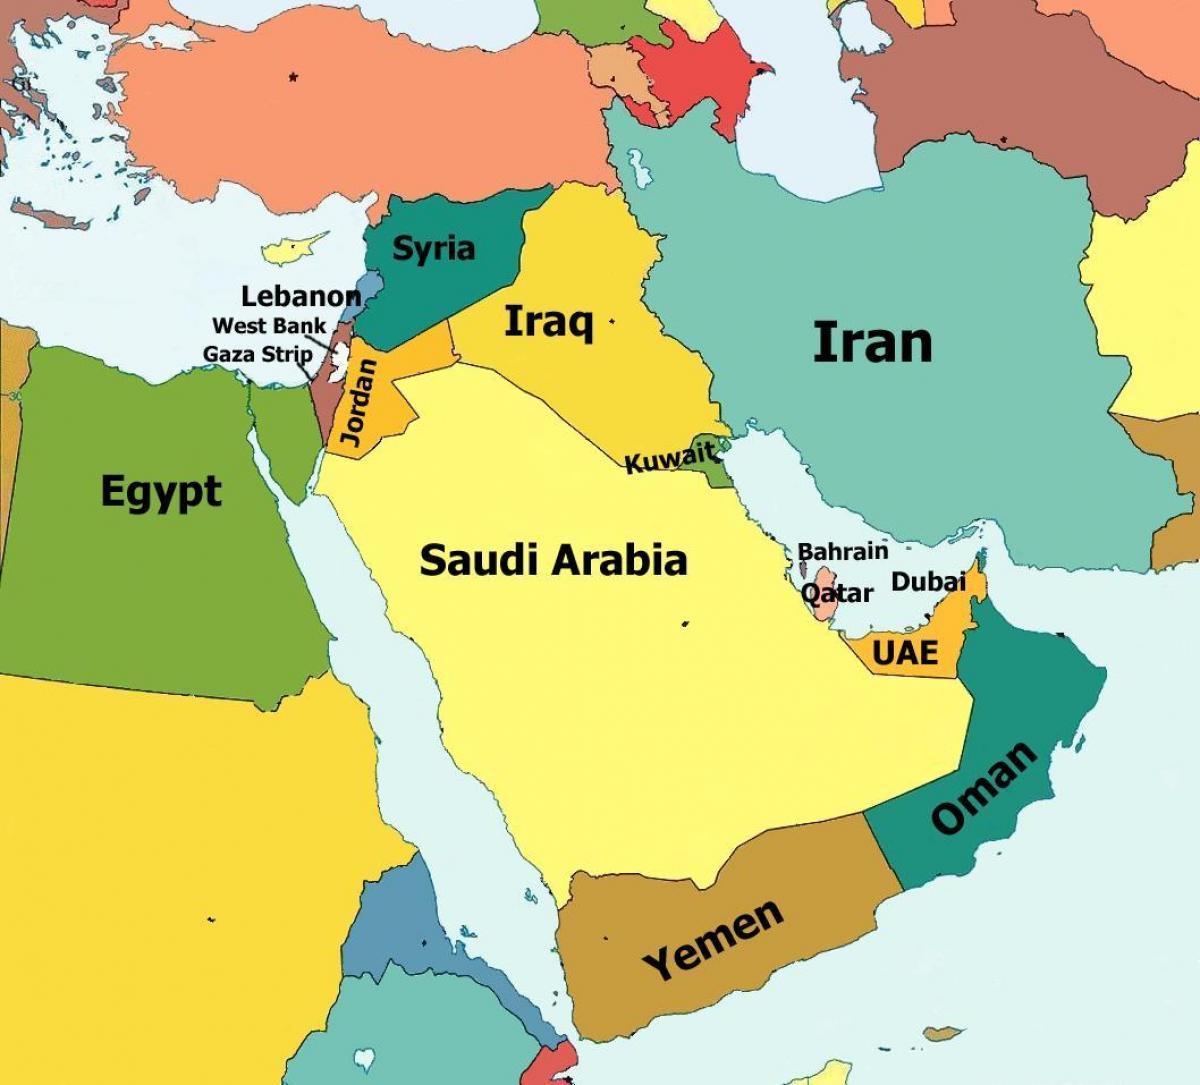 Dubai On The Map on